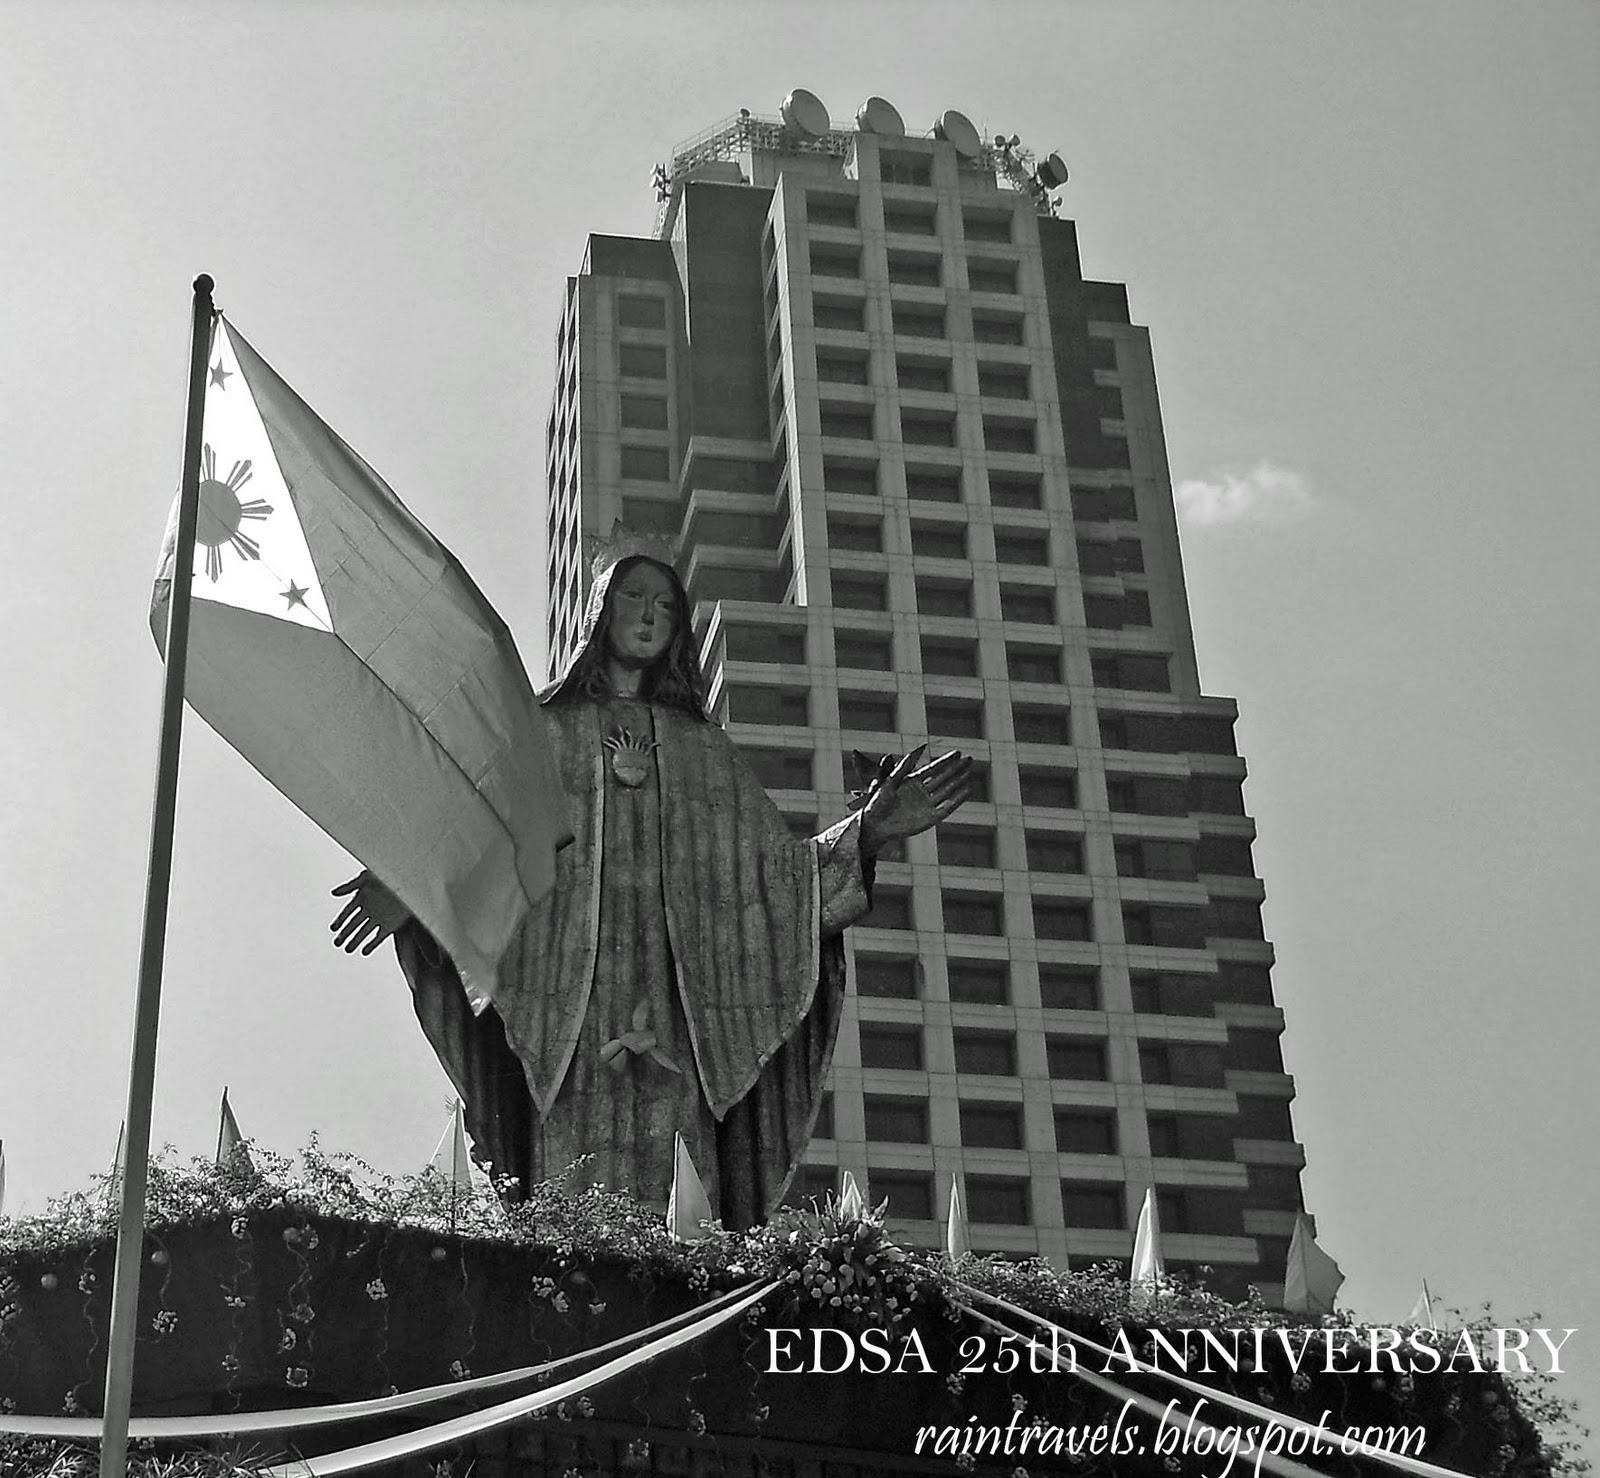 essay of edsa revolution 25th anniversary